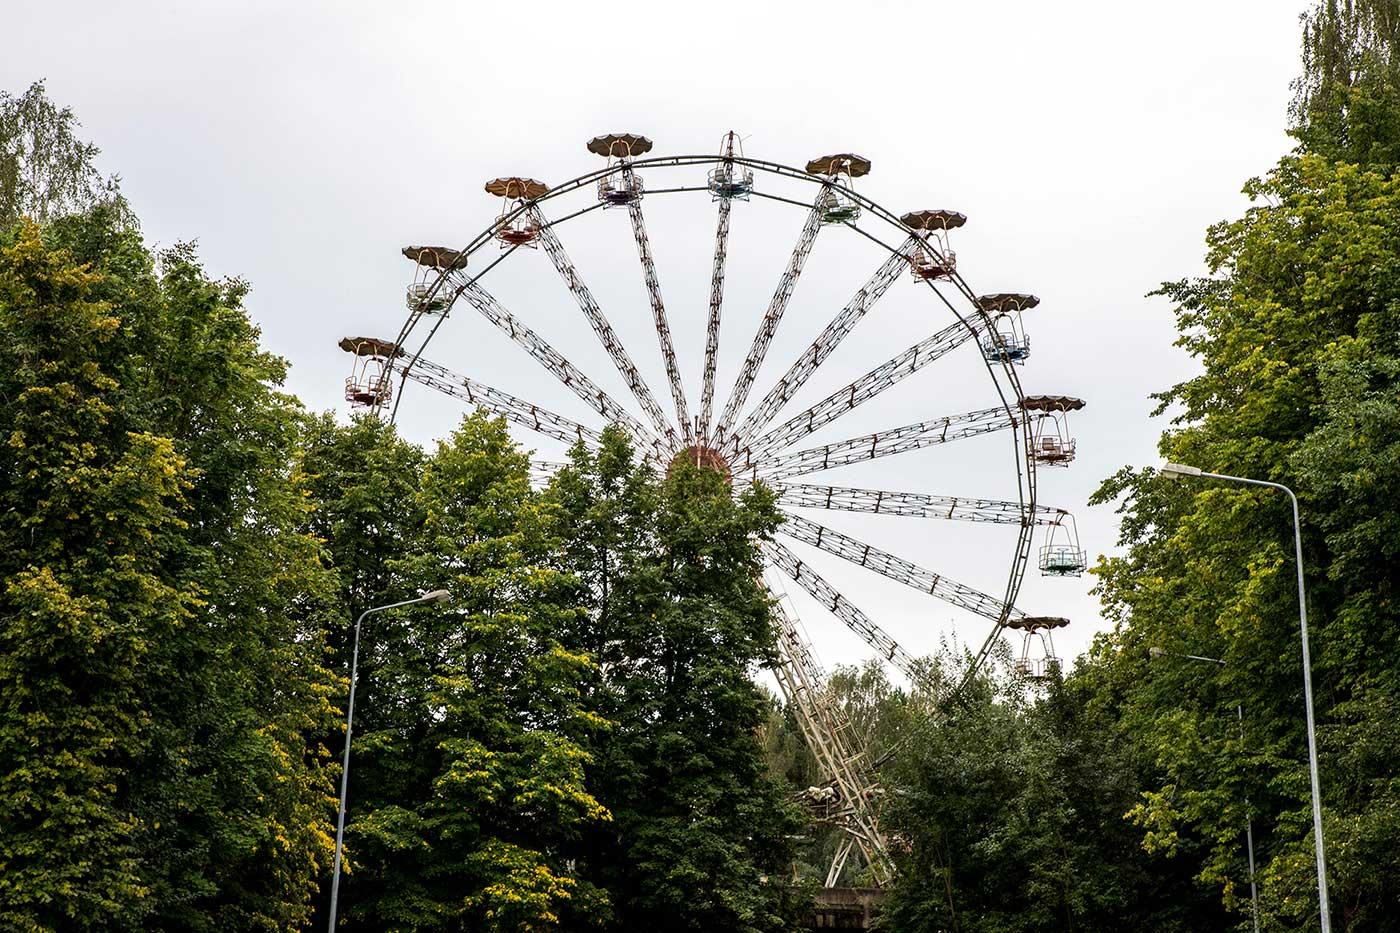 The Ferris wheel at Elektrėnai has been destroyed since these photographs were taken. Elektrėnai, Lithuania.